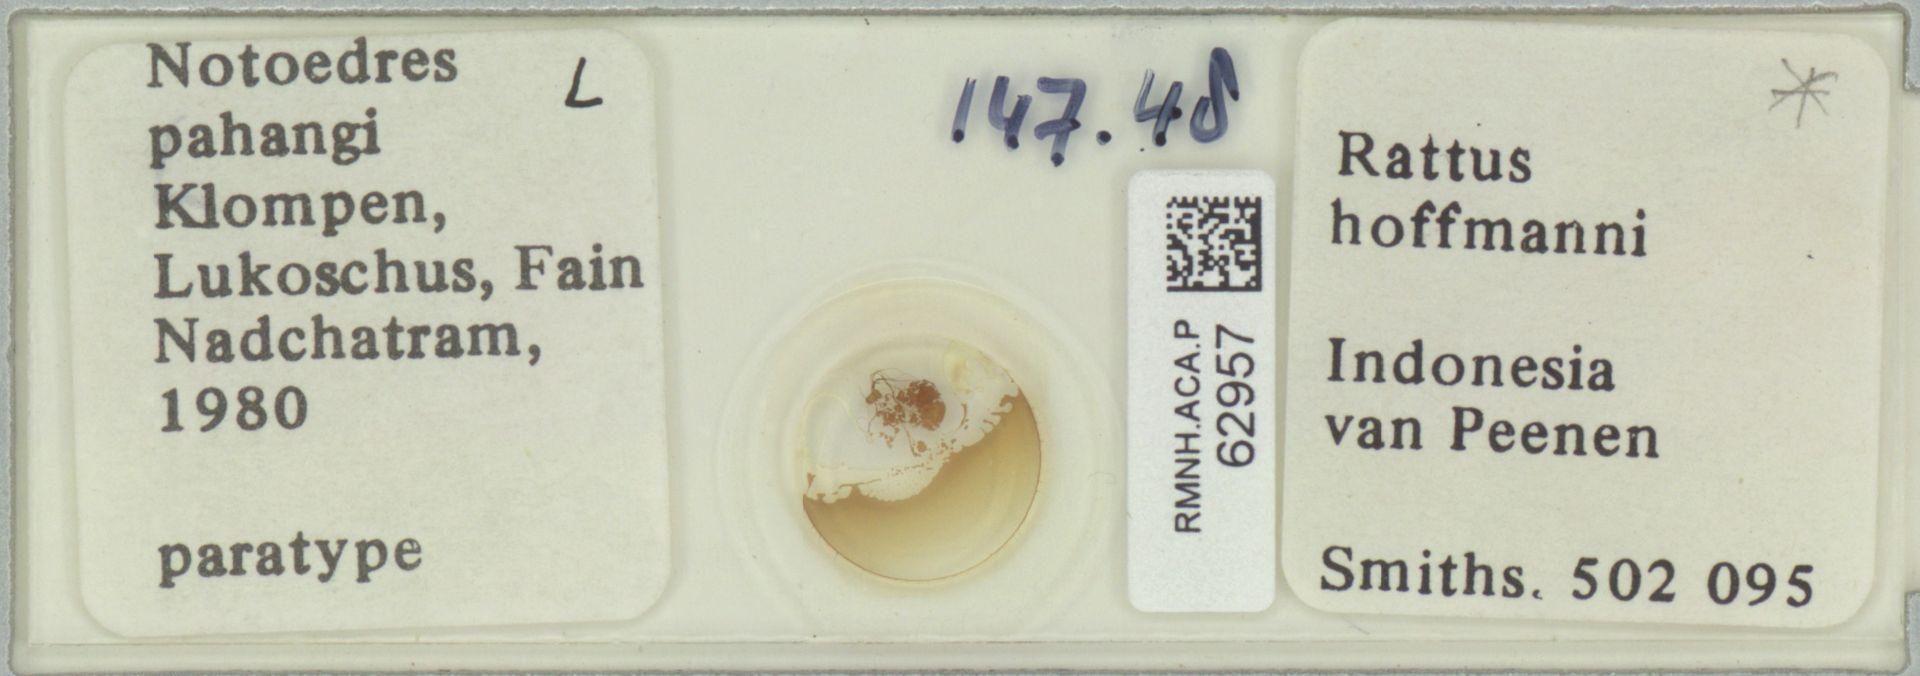 RMNH.ACA.P.62957   Notoedres pahangi Klompen, Lukoschus, Fain, Nadchatram 1980